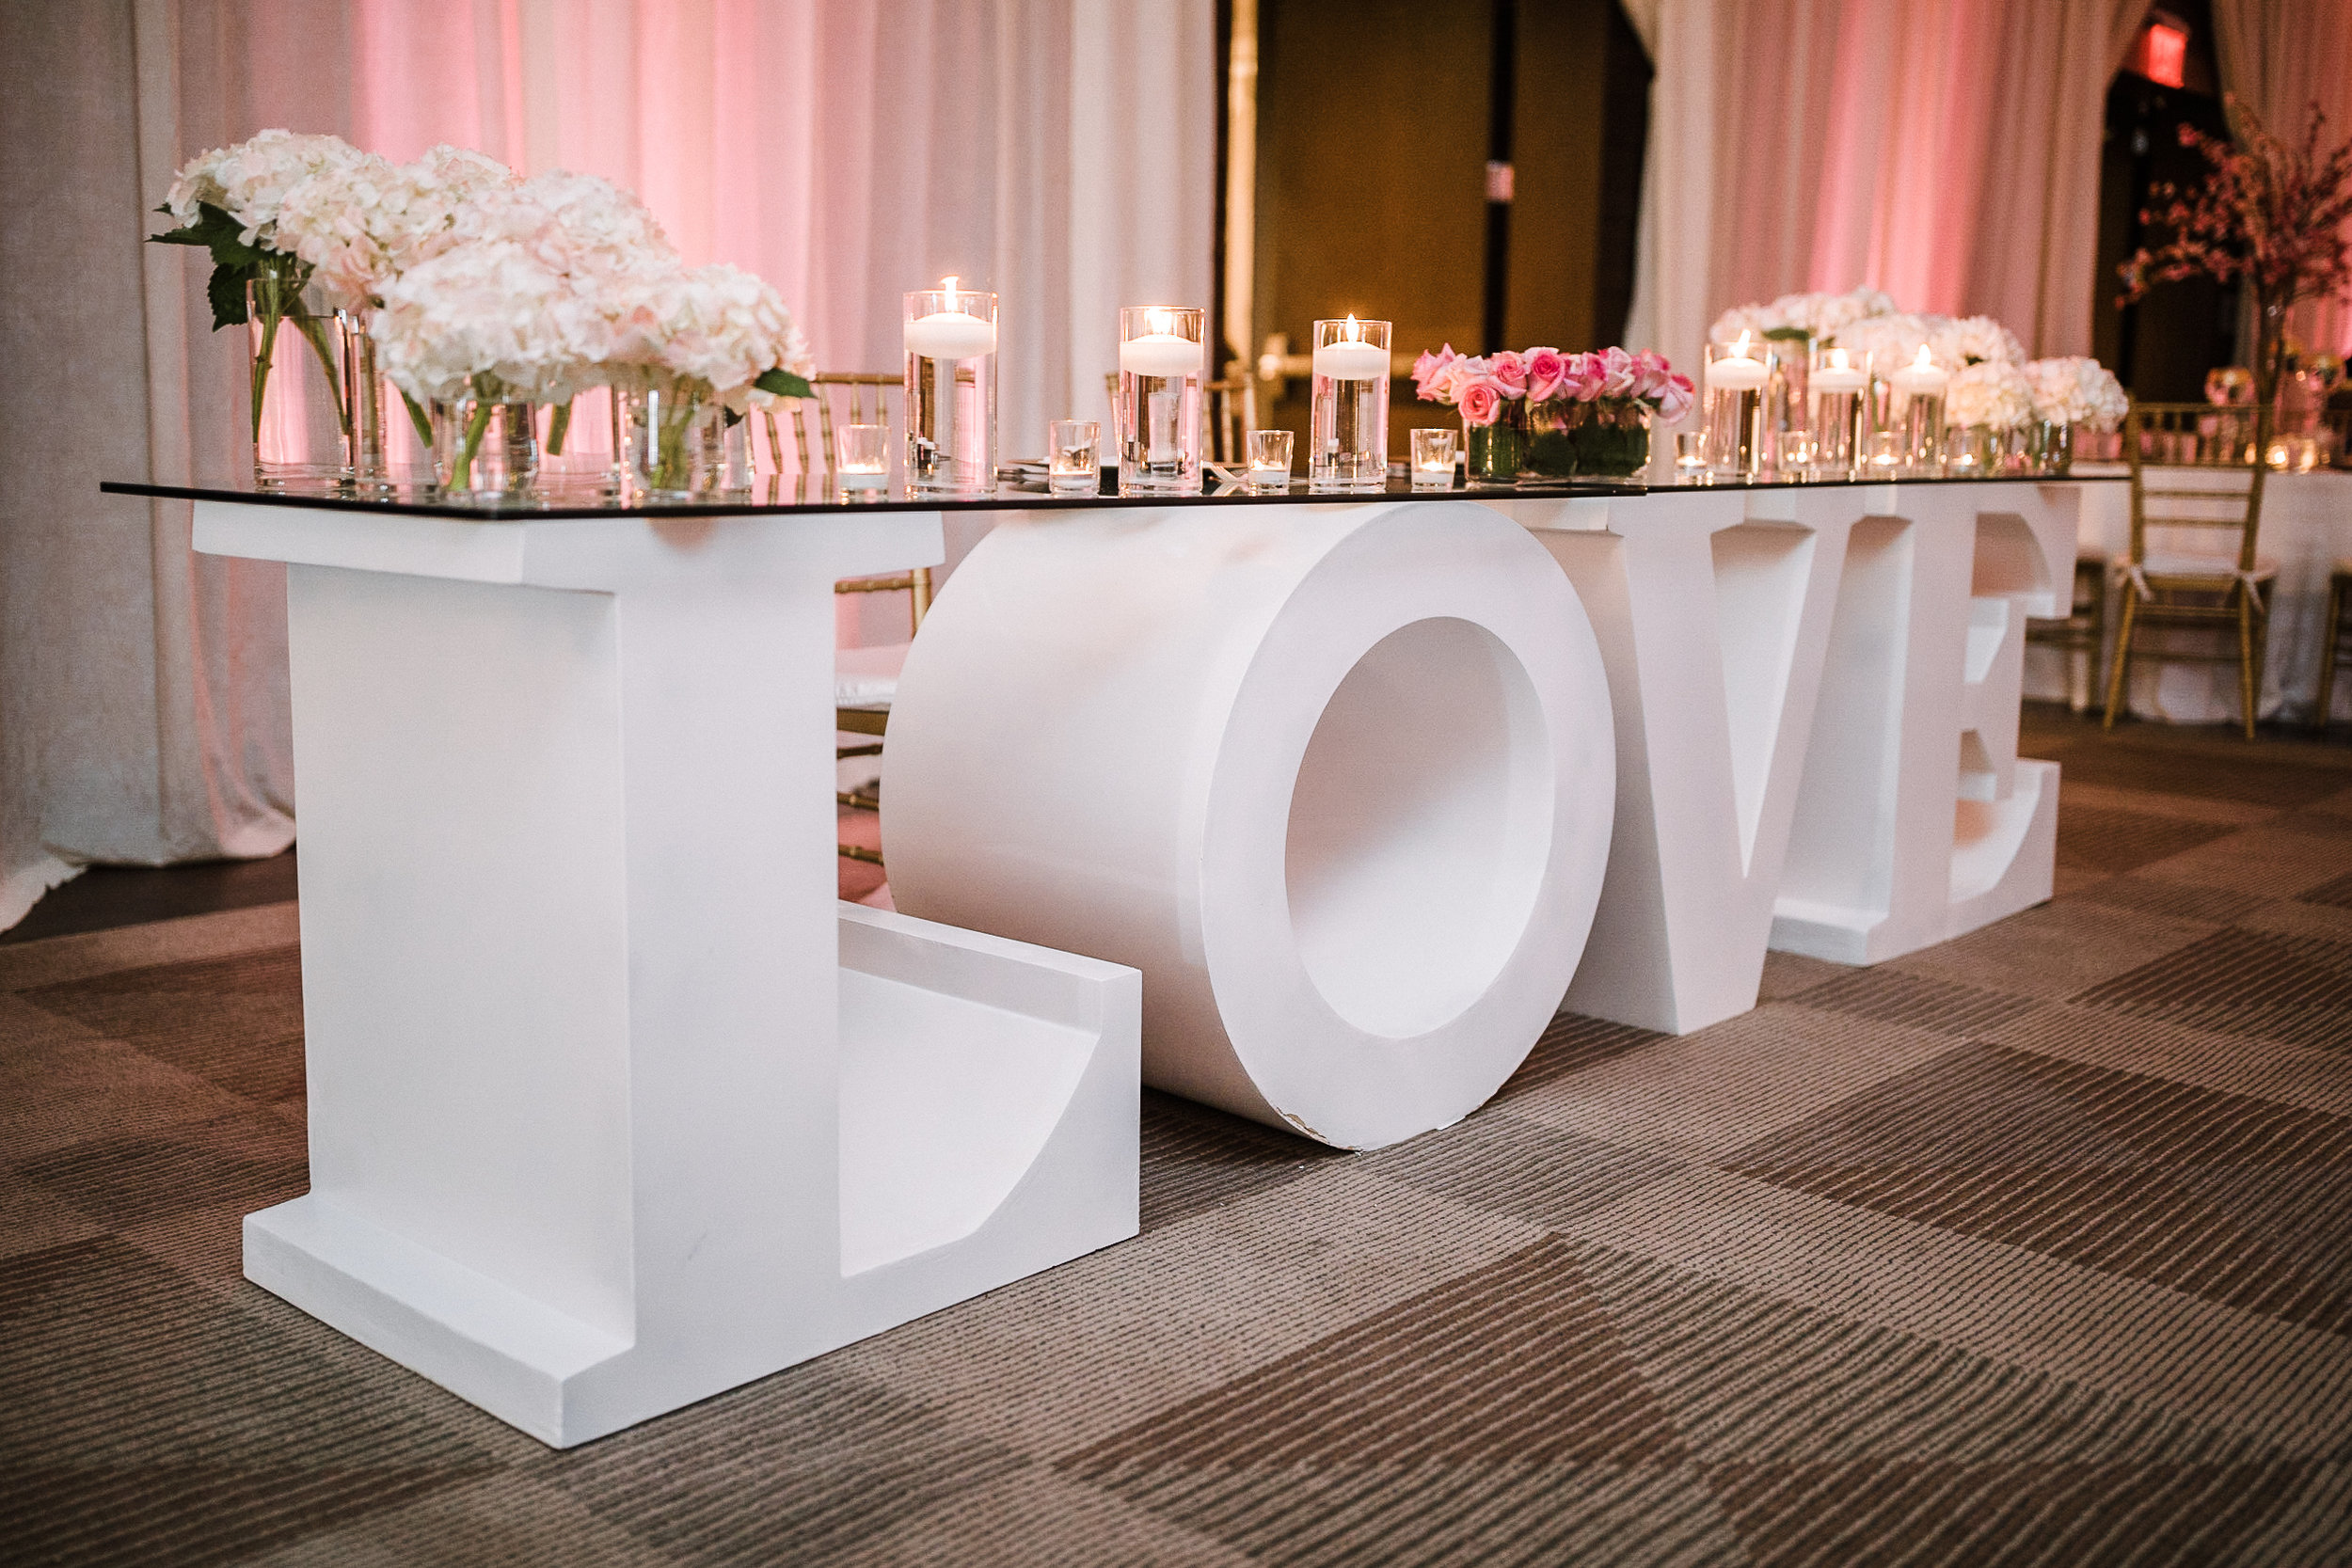 details at reception at The Park Hyatt Hotel in Washington DC